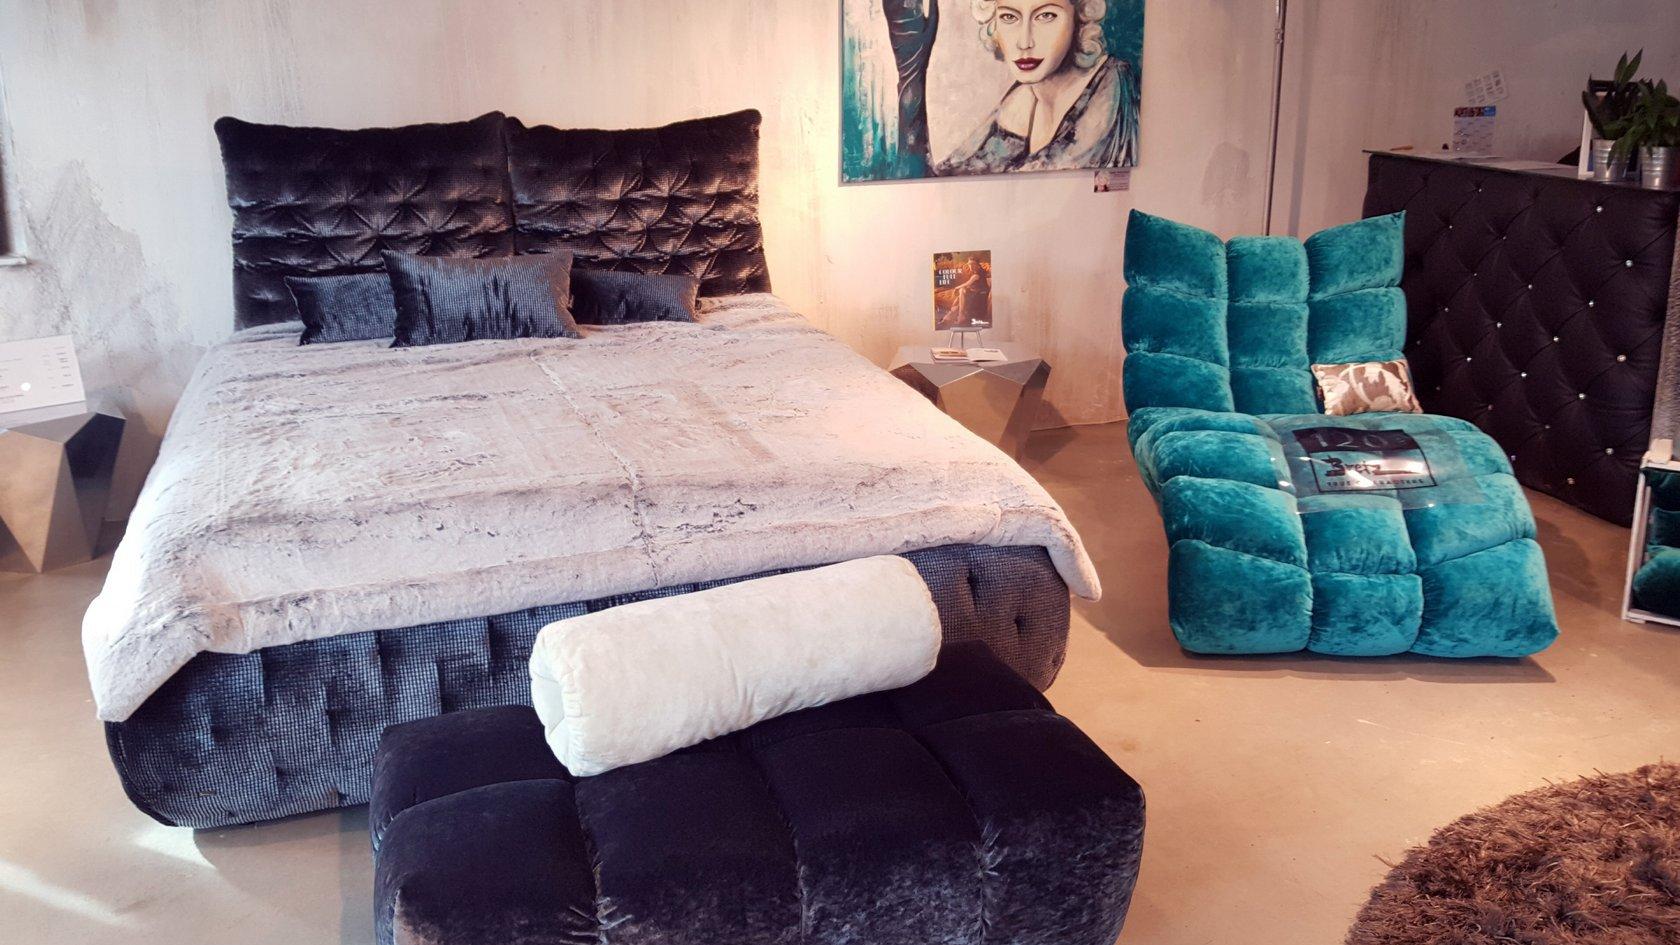 14 bretz dortmund feya bett bretz store dortmund. Black Bedroom Furniture Sets. Home Design Ideas